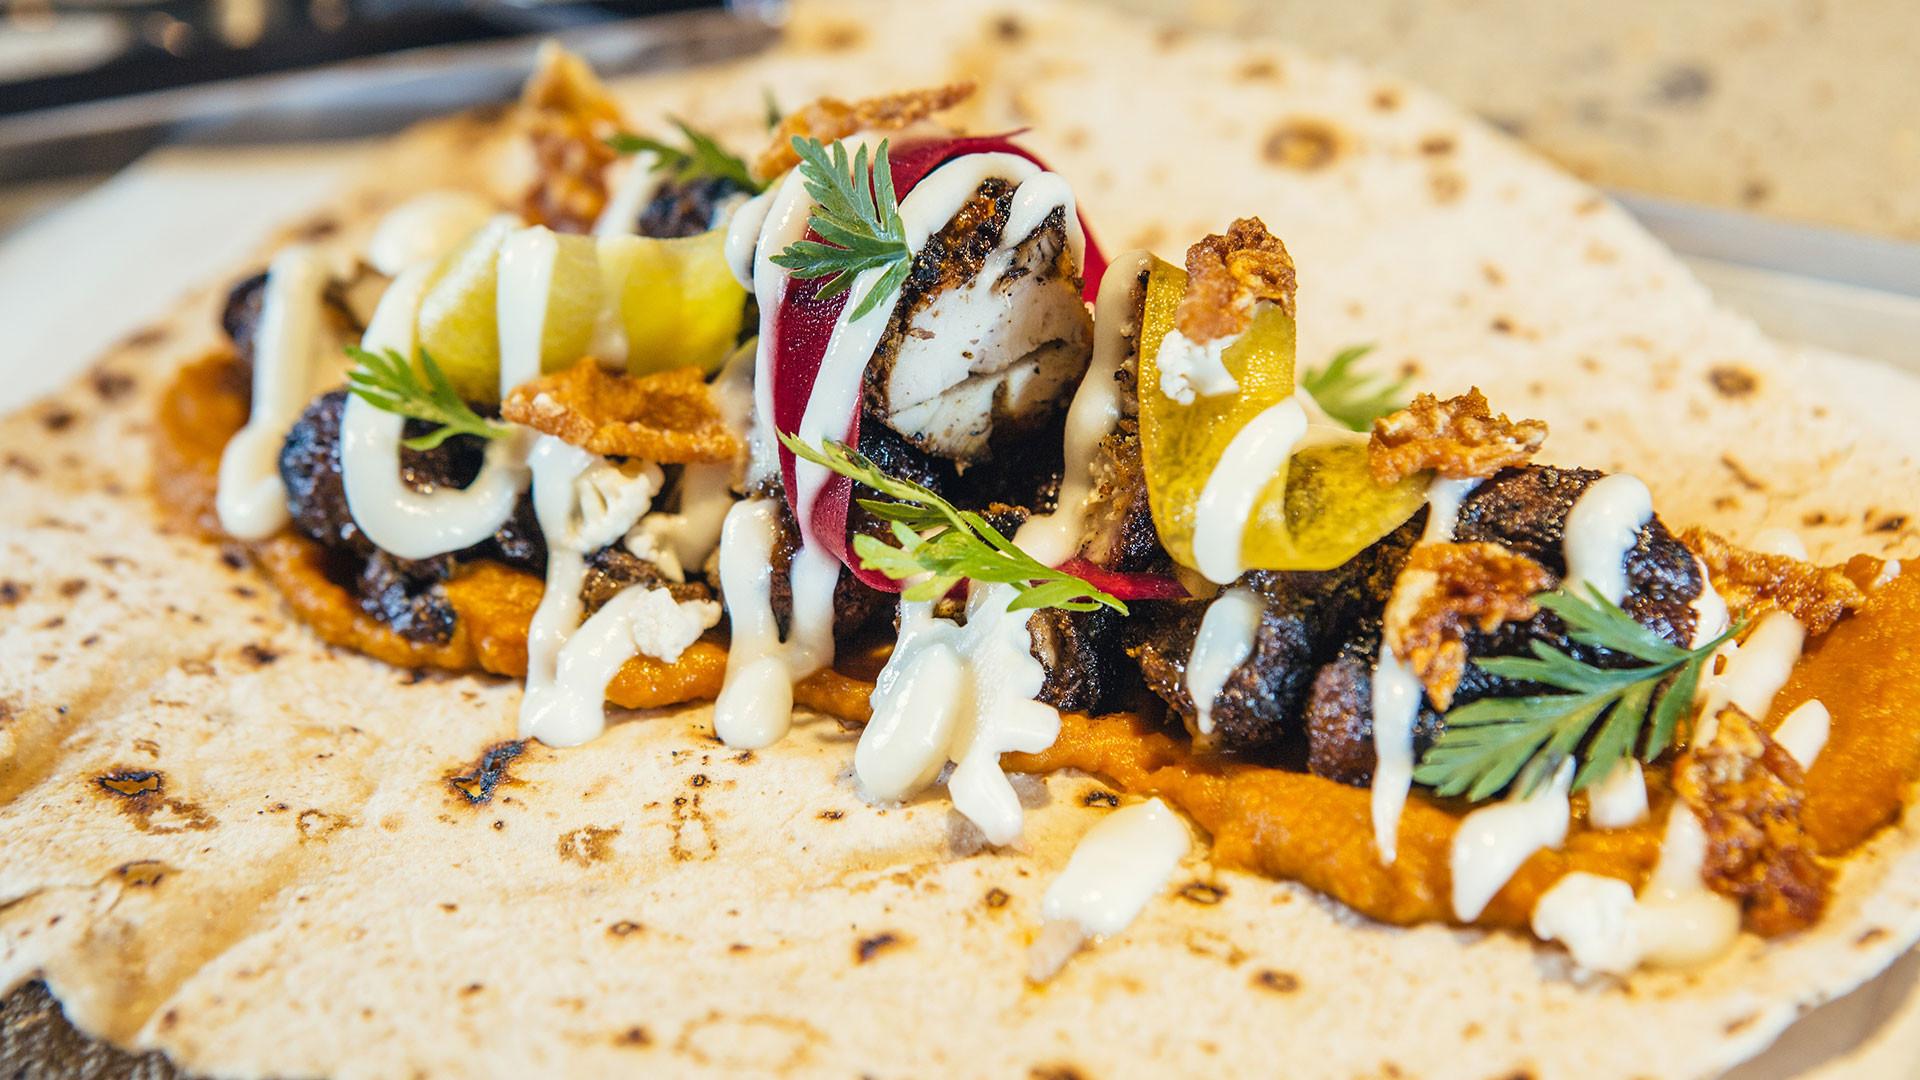 Le Bab's free-range pork shawarma kebab